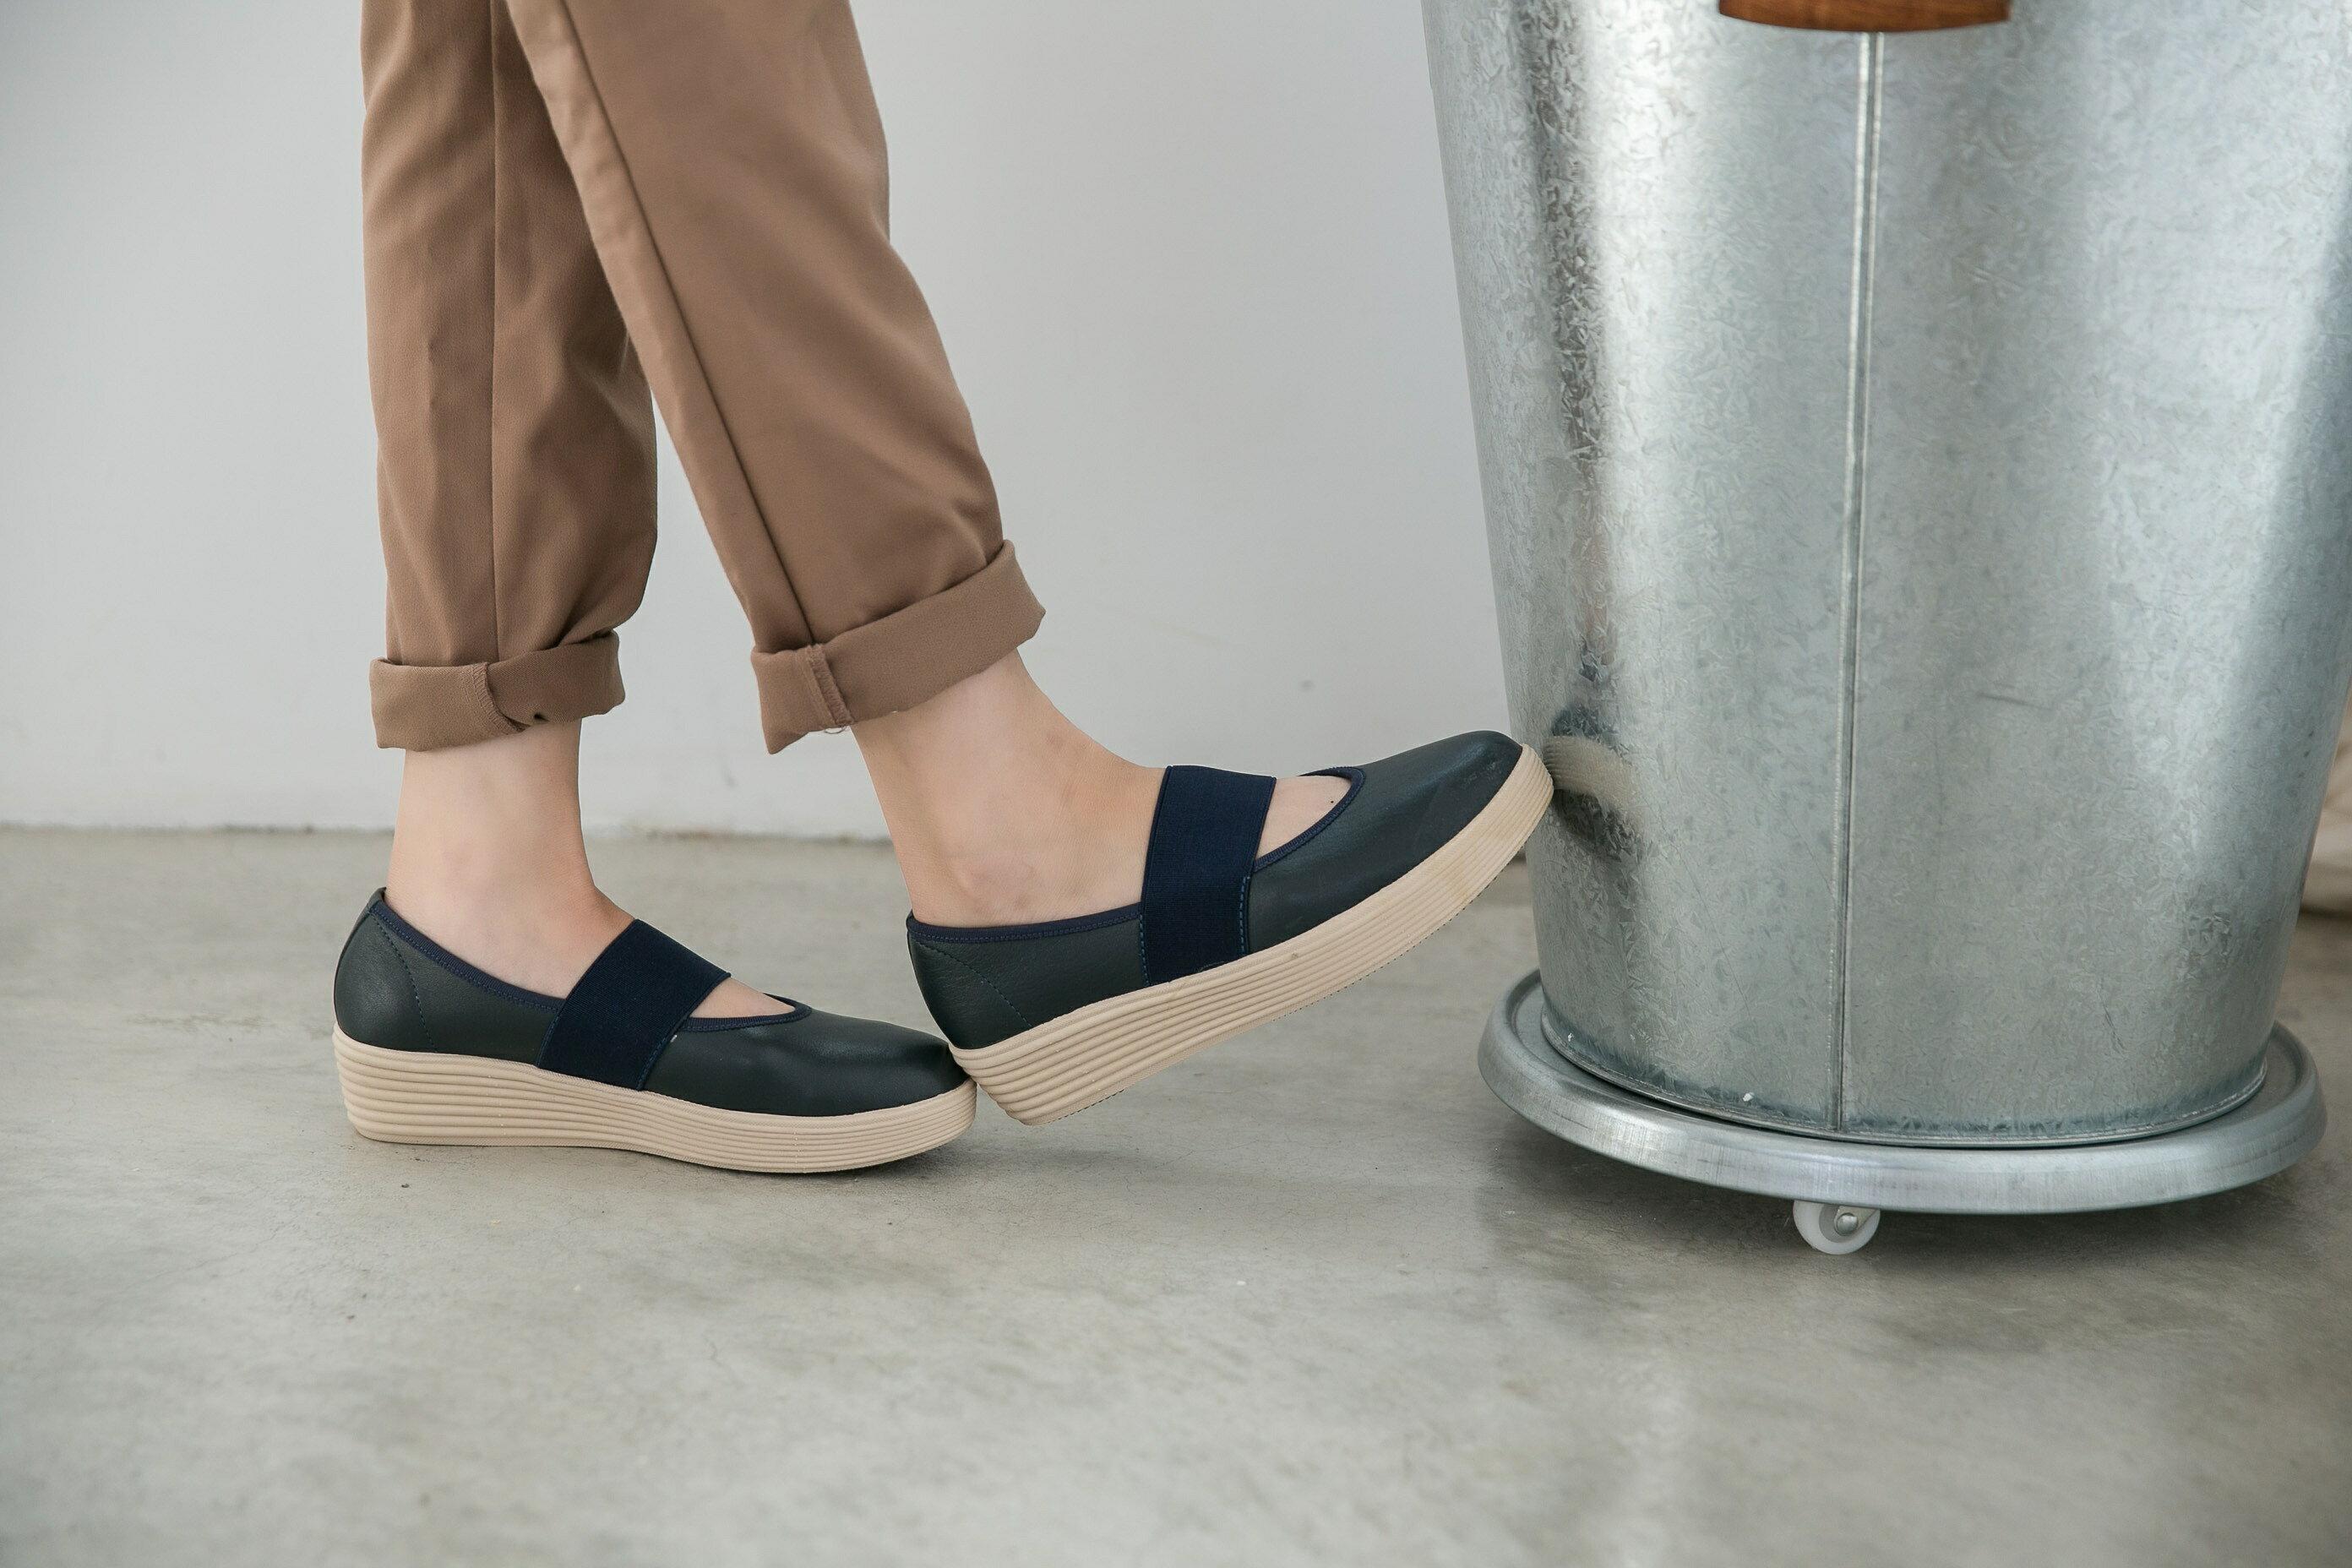 Aimez La Vie 超輕氣墊鞋|圓頭鬆緊帶厚牛皮休閒鞋 3